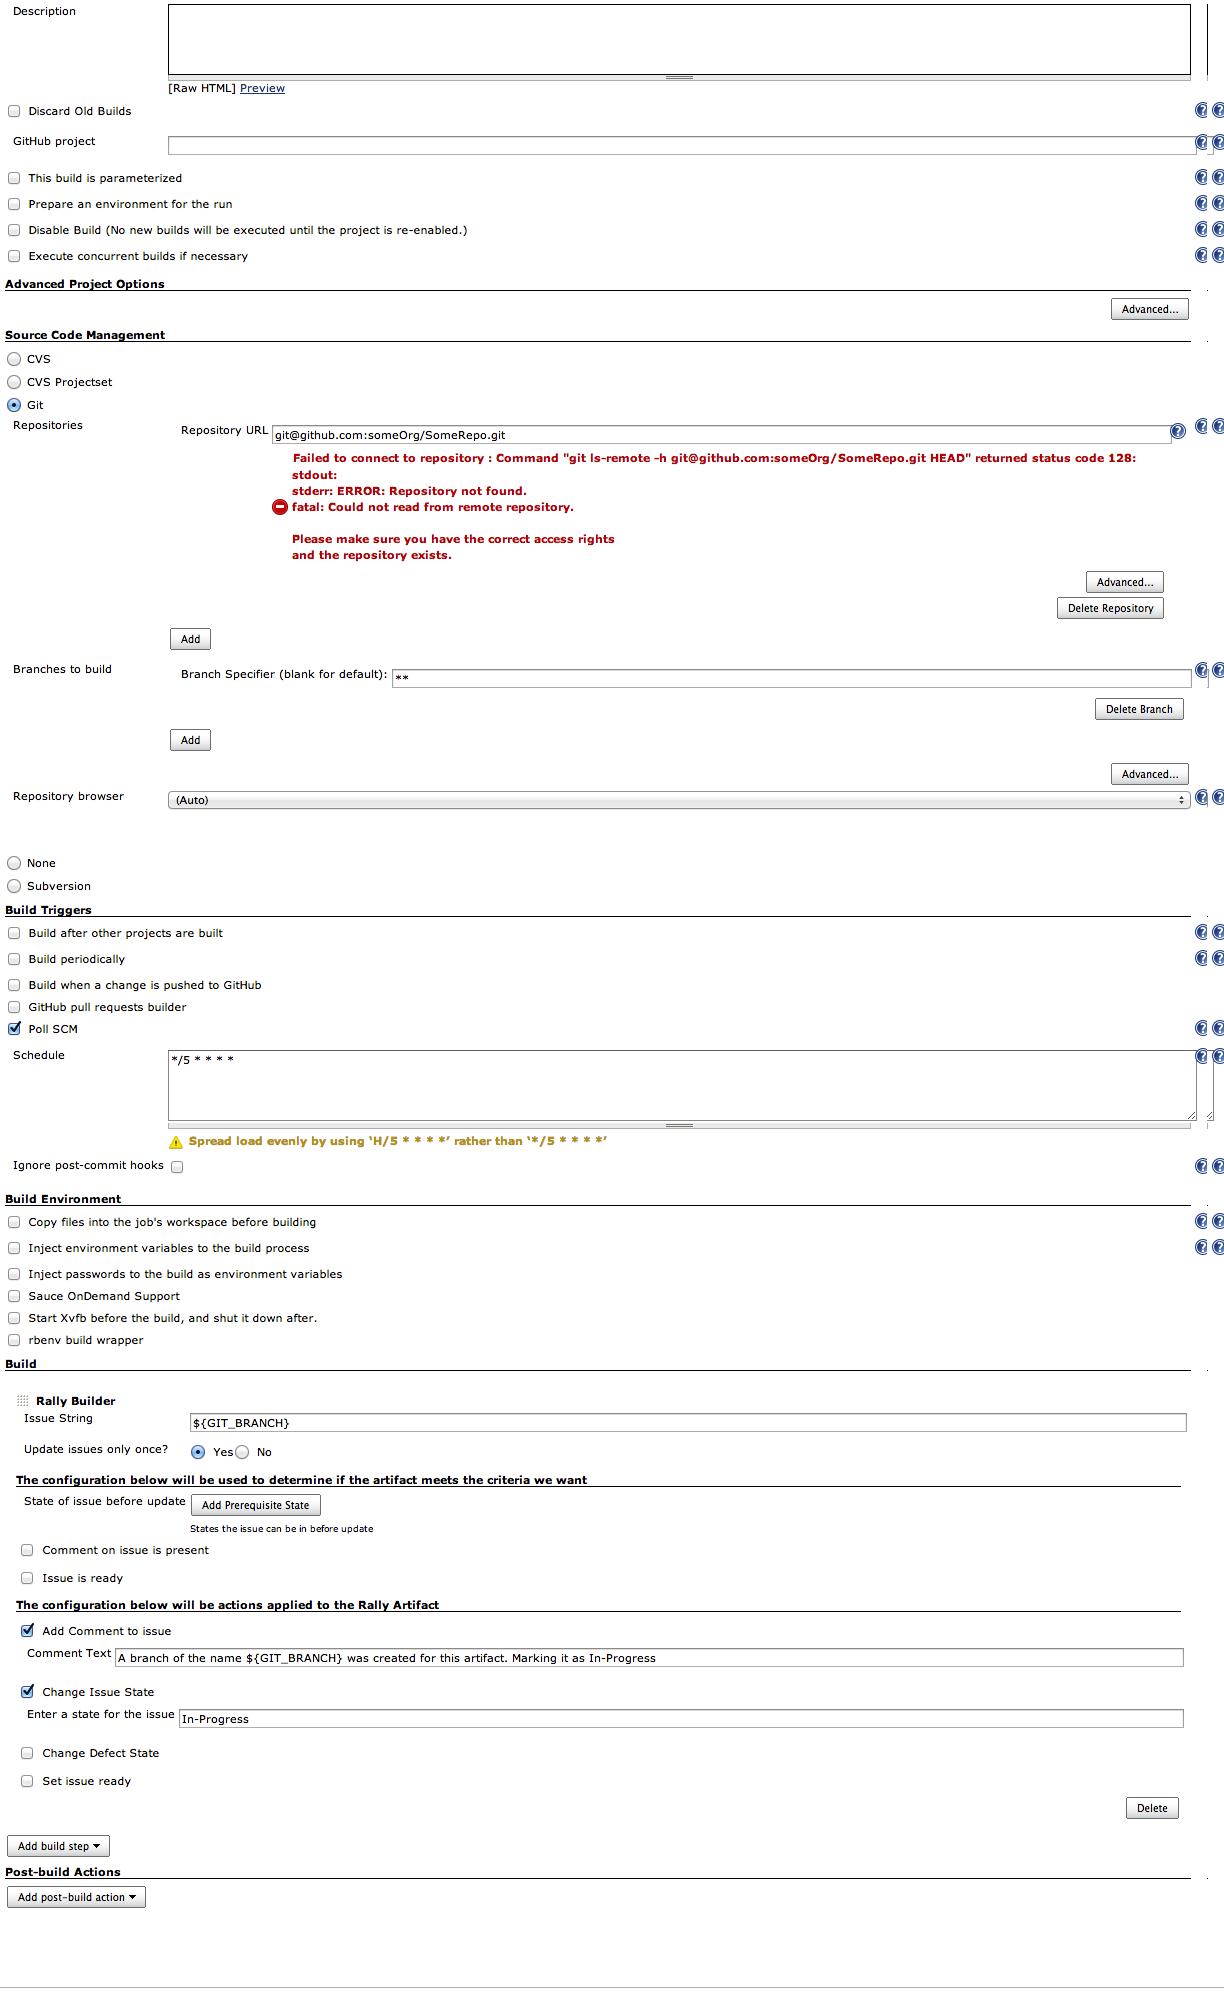 GitHub - joshughes/rallyBuild: Jenkins Plugin for Rally Artifact Actions